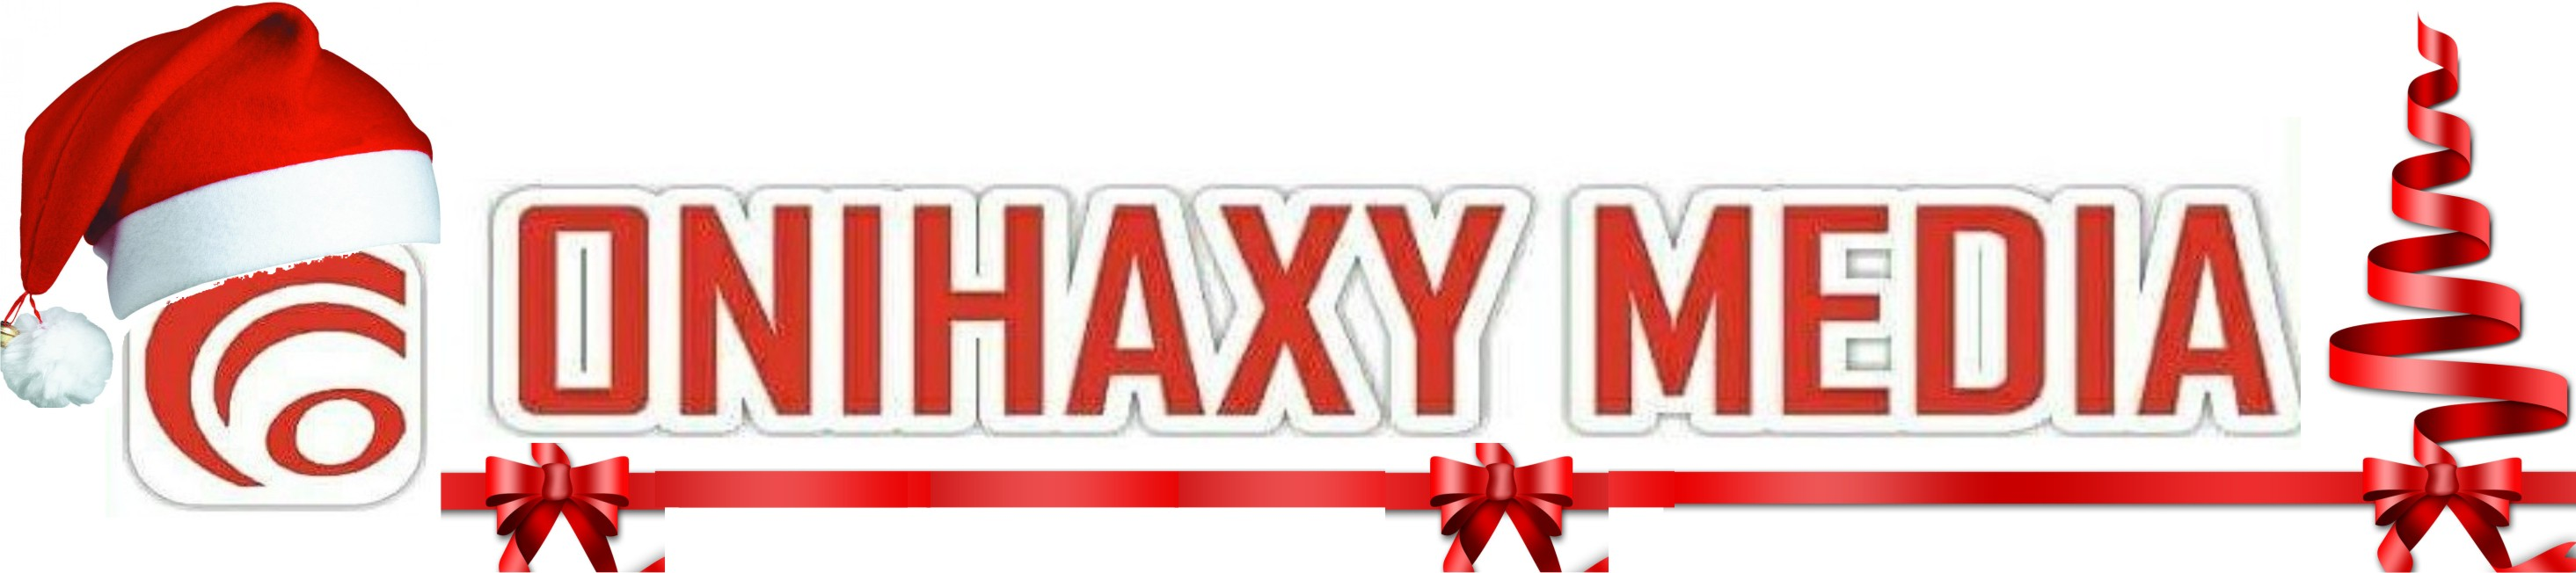 onihaxy media